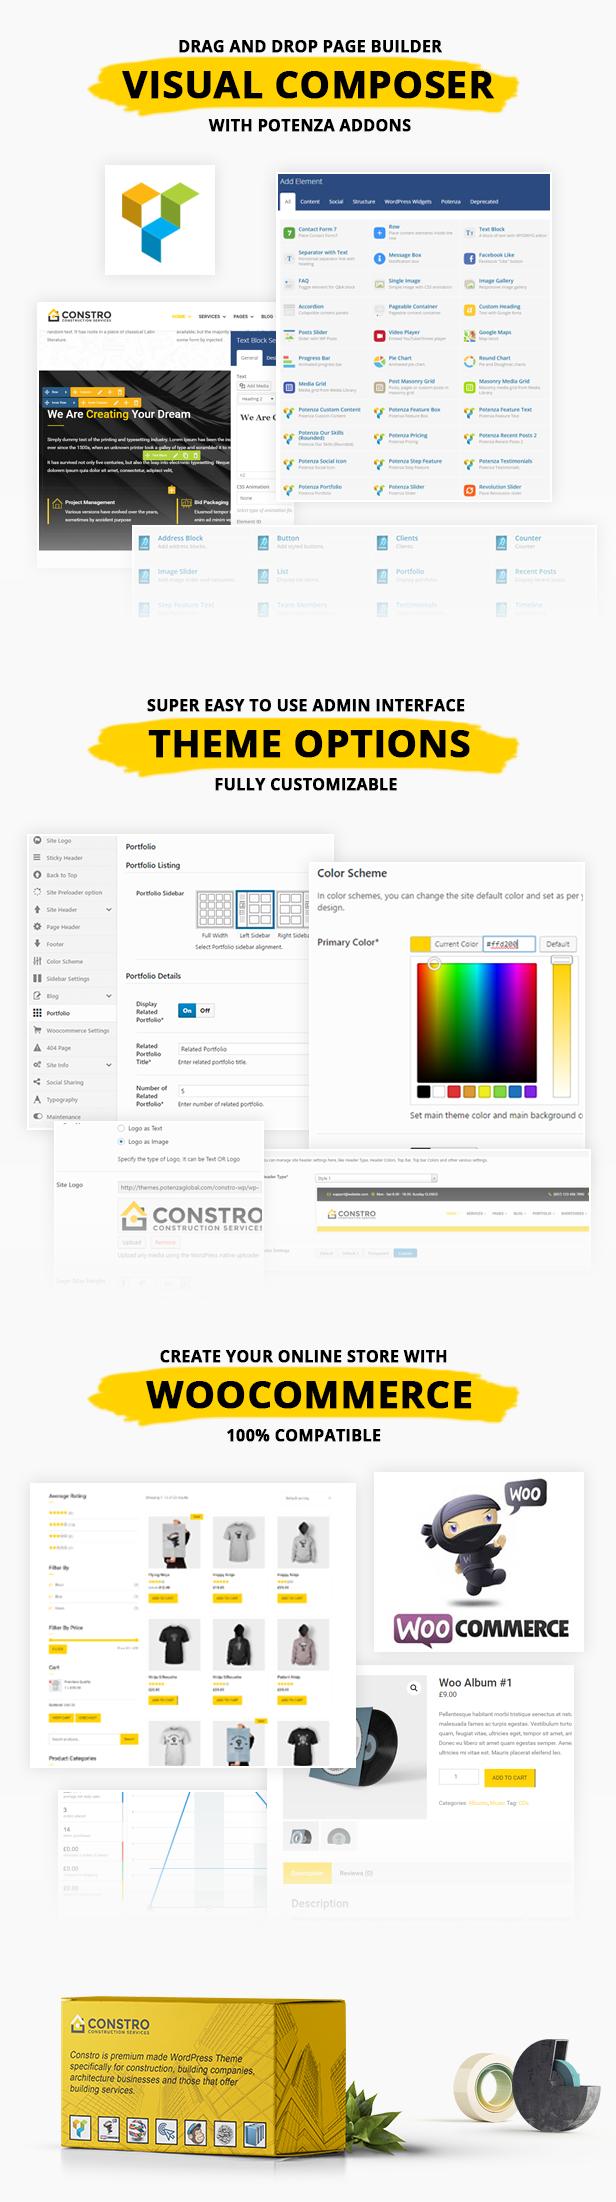 Constro - Baugeschäft WordPress Theme - 3